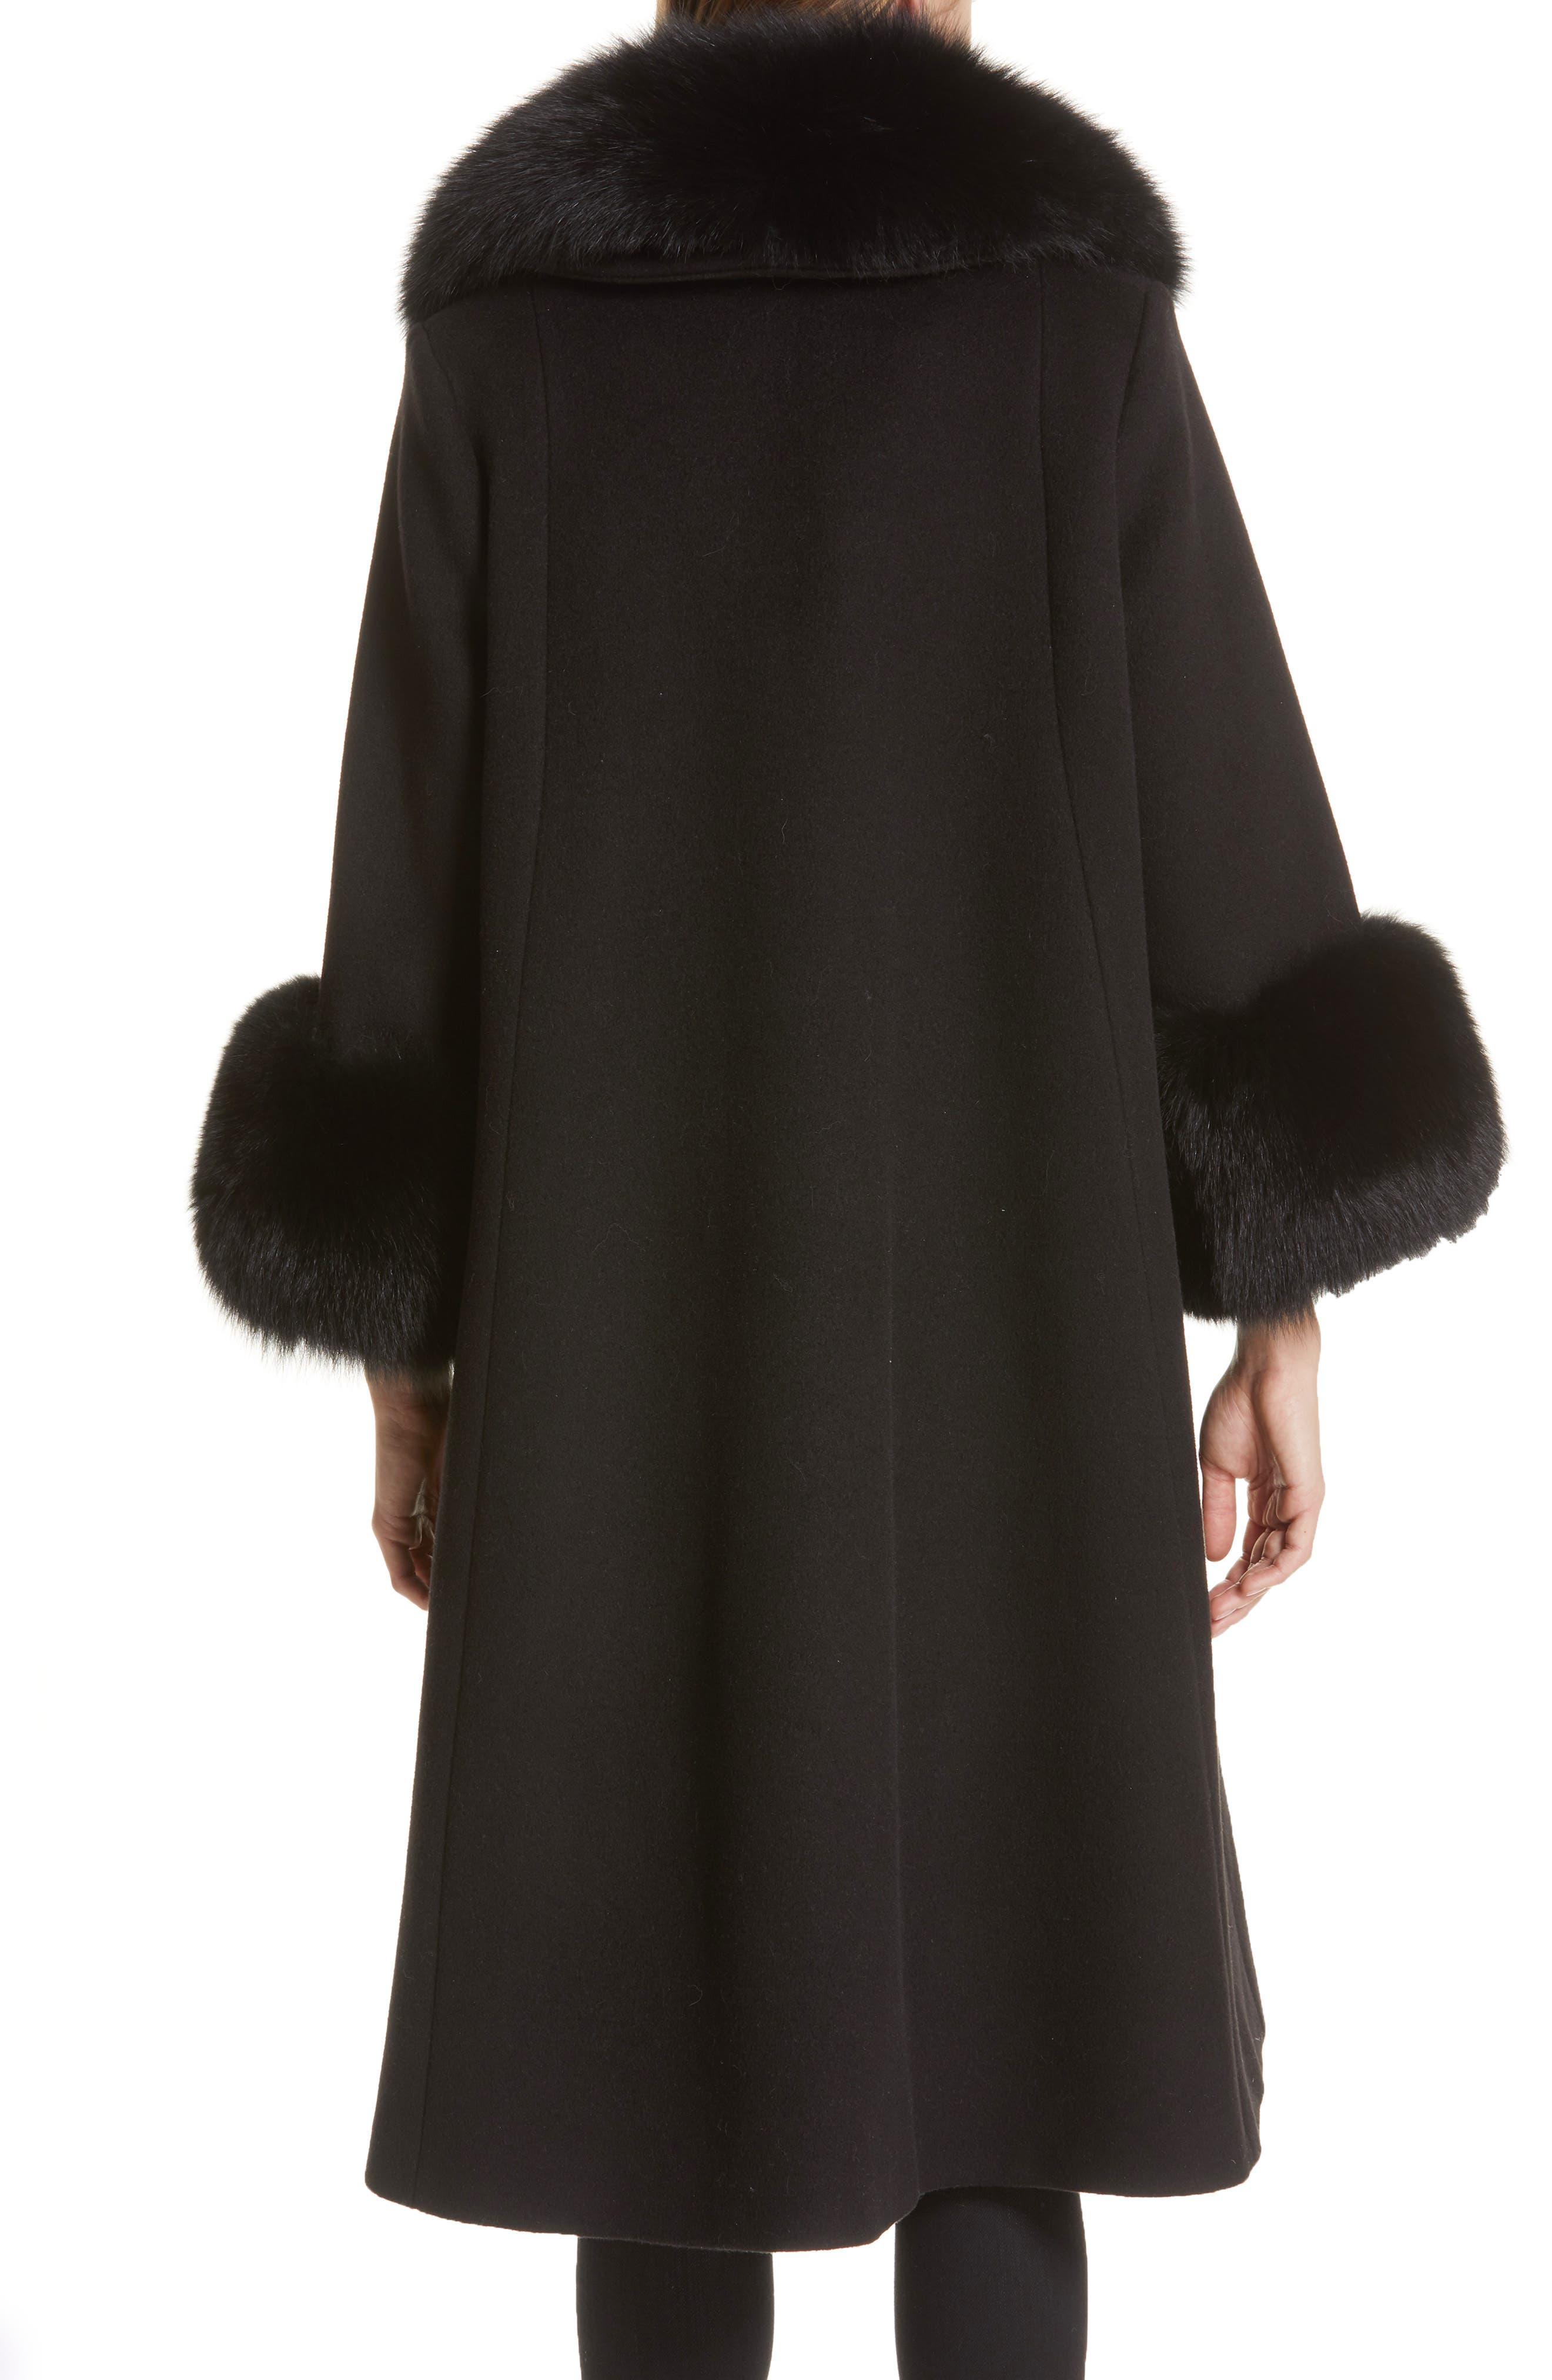 SAKS POTTS,                             Yvonne Wool Coat with Genuine Fox Fur Trim,                             Alternate thumbnail 2, color,                             001